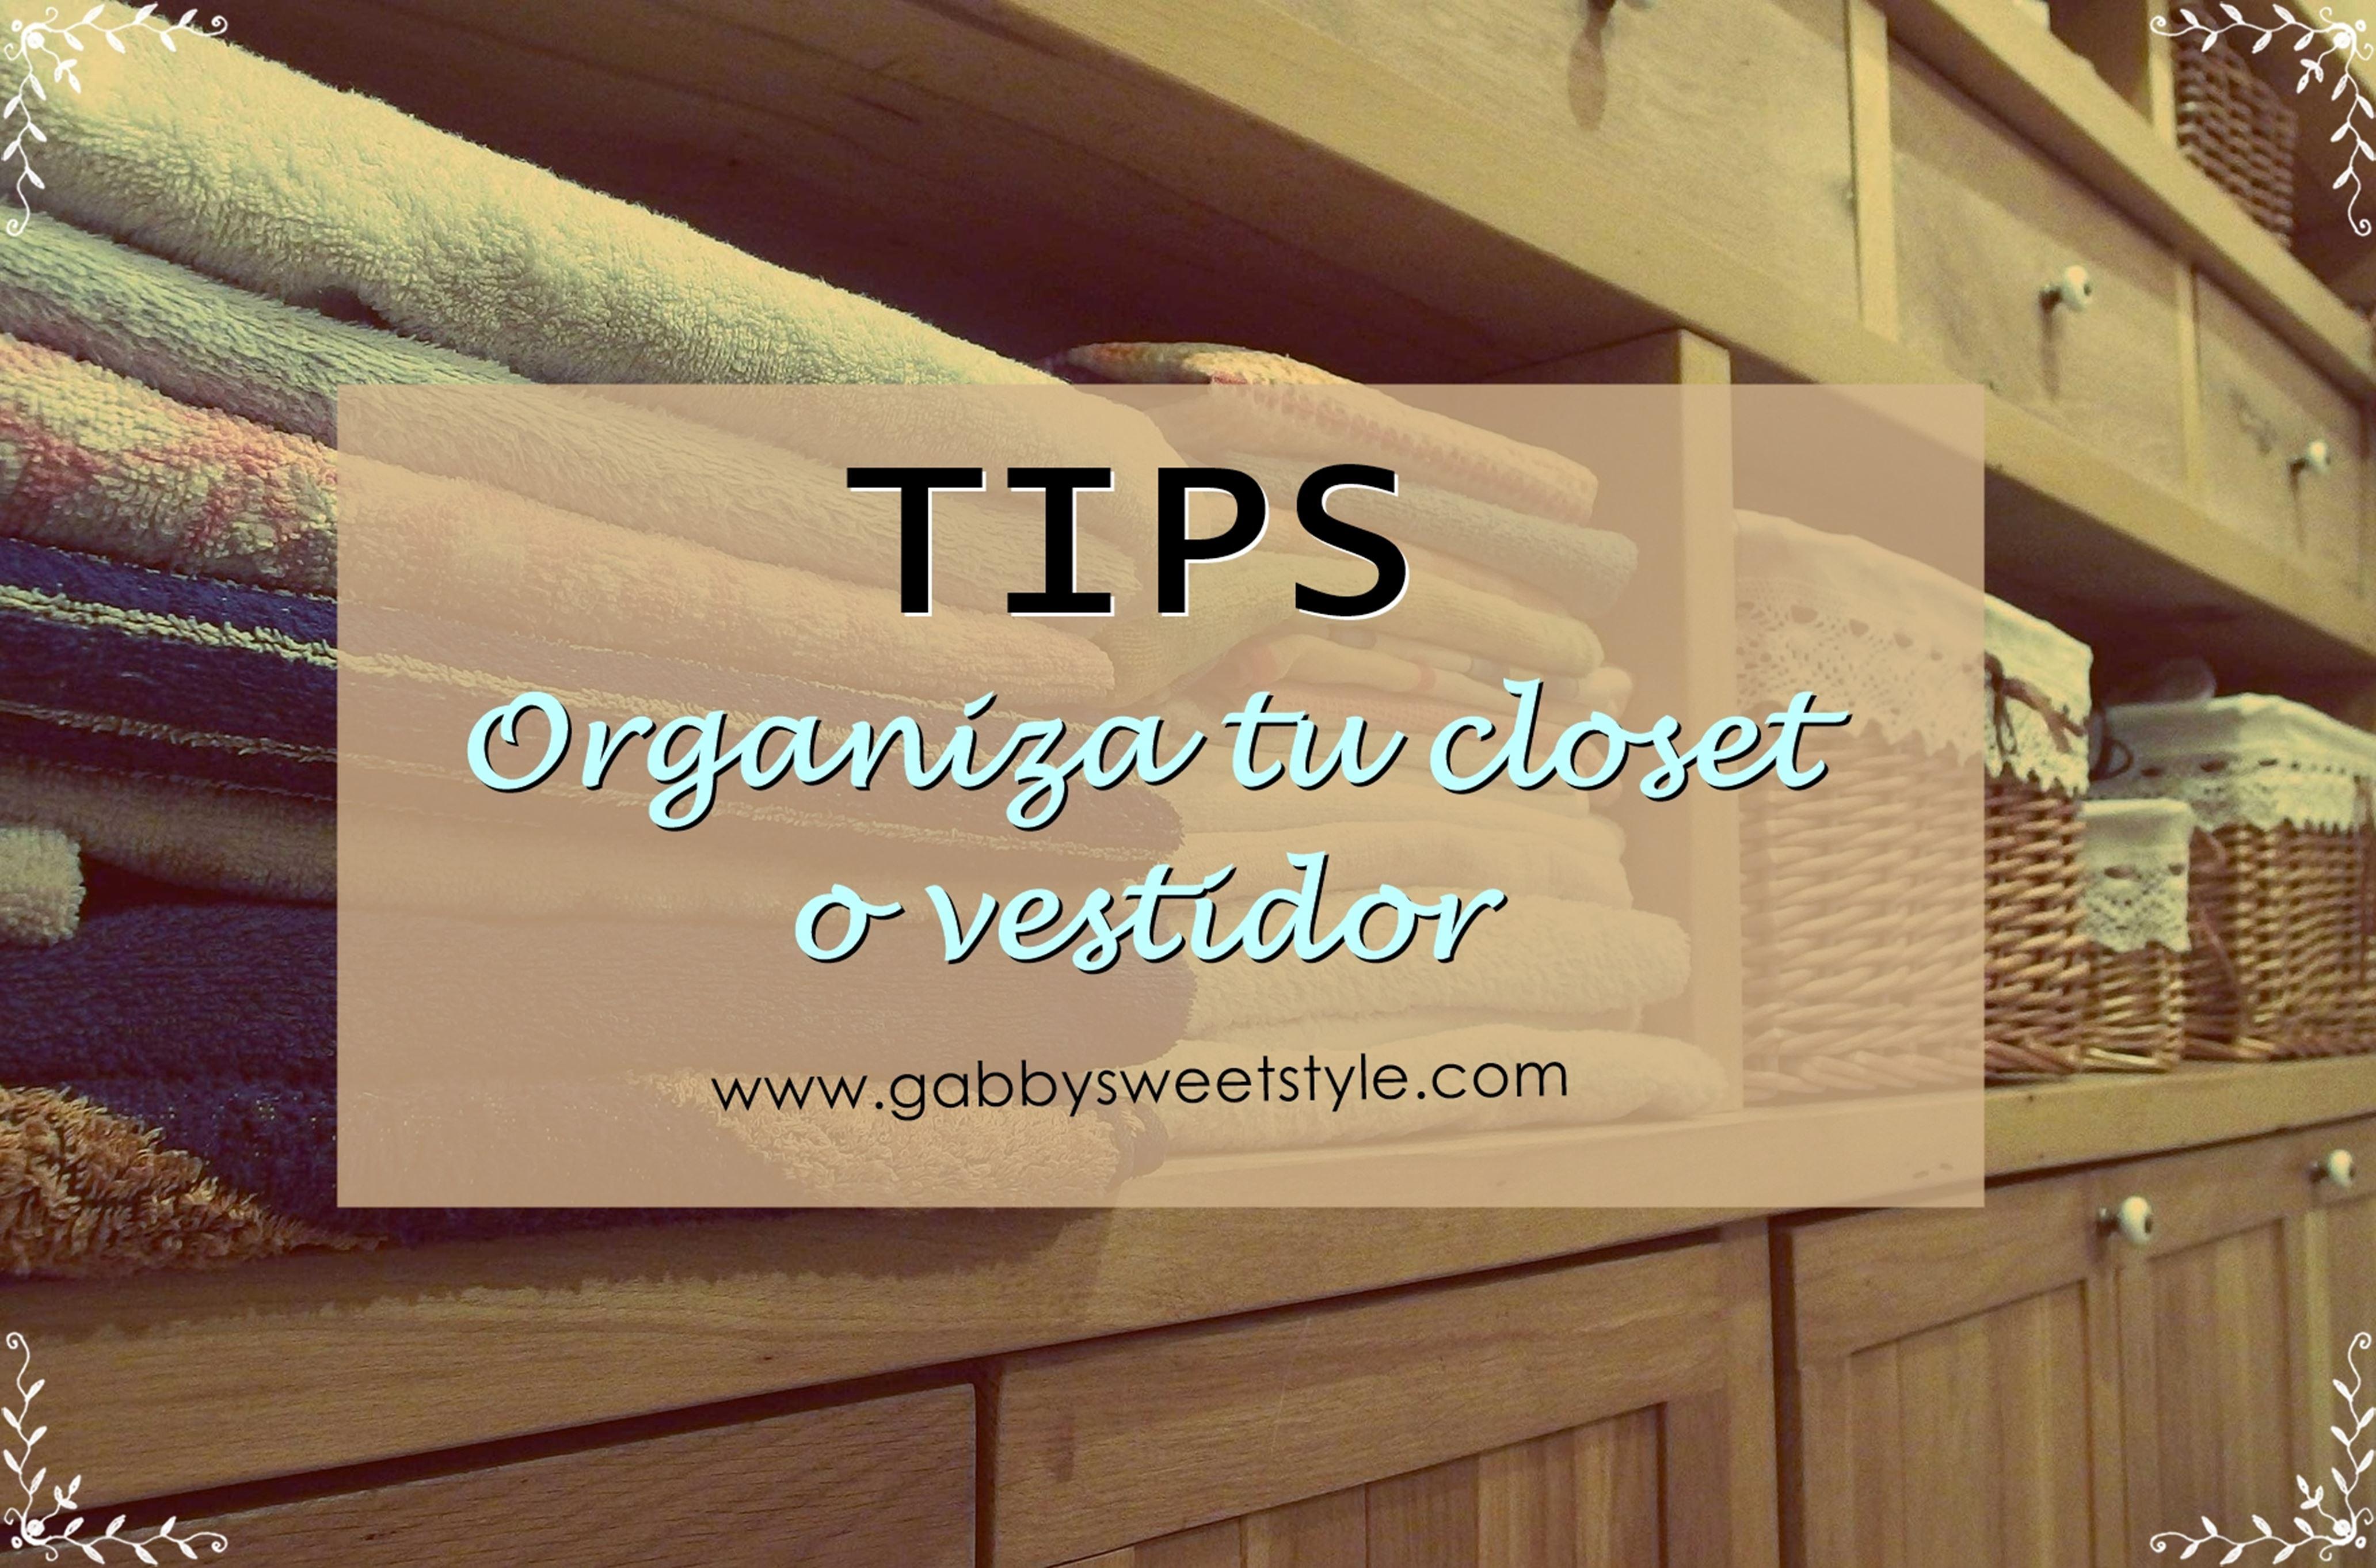 Organiza tu closet o vestidor